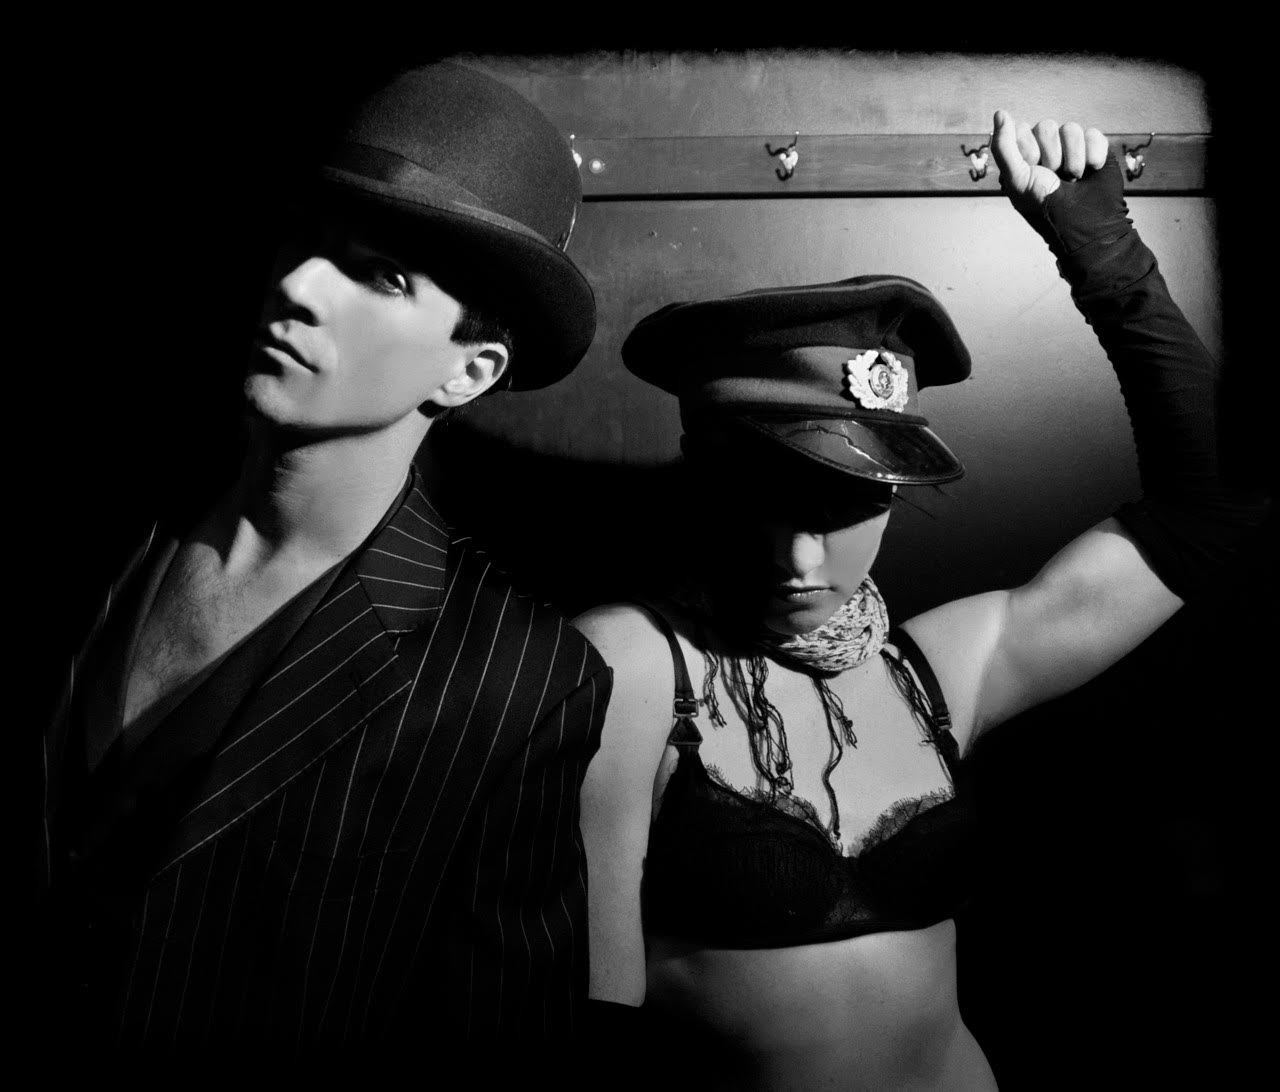 Dresden Dolls main